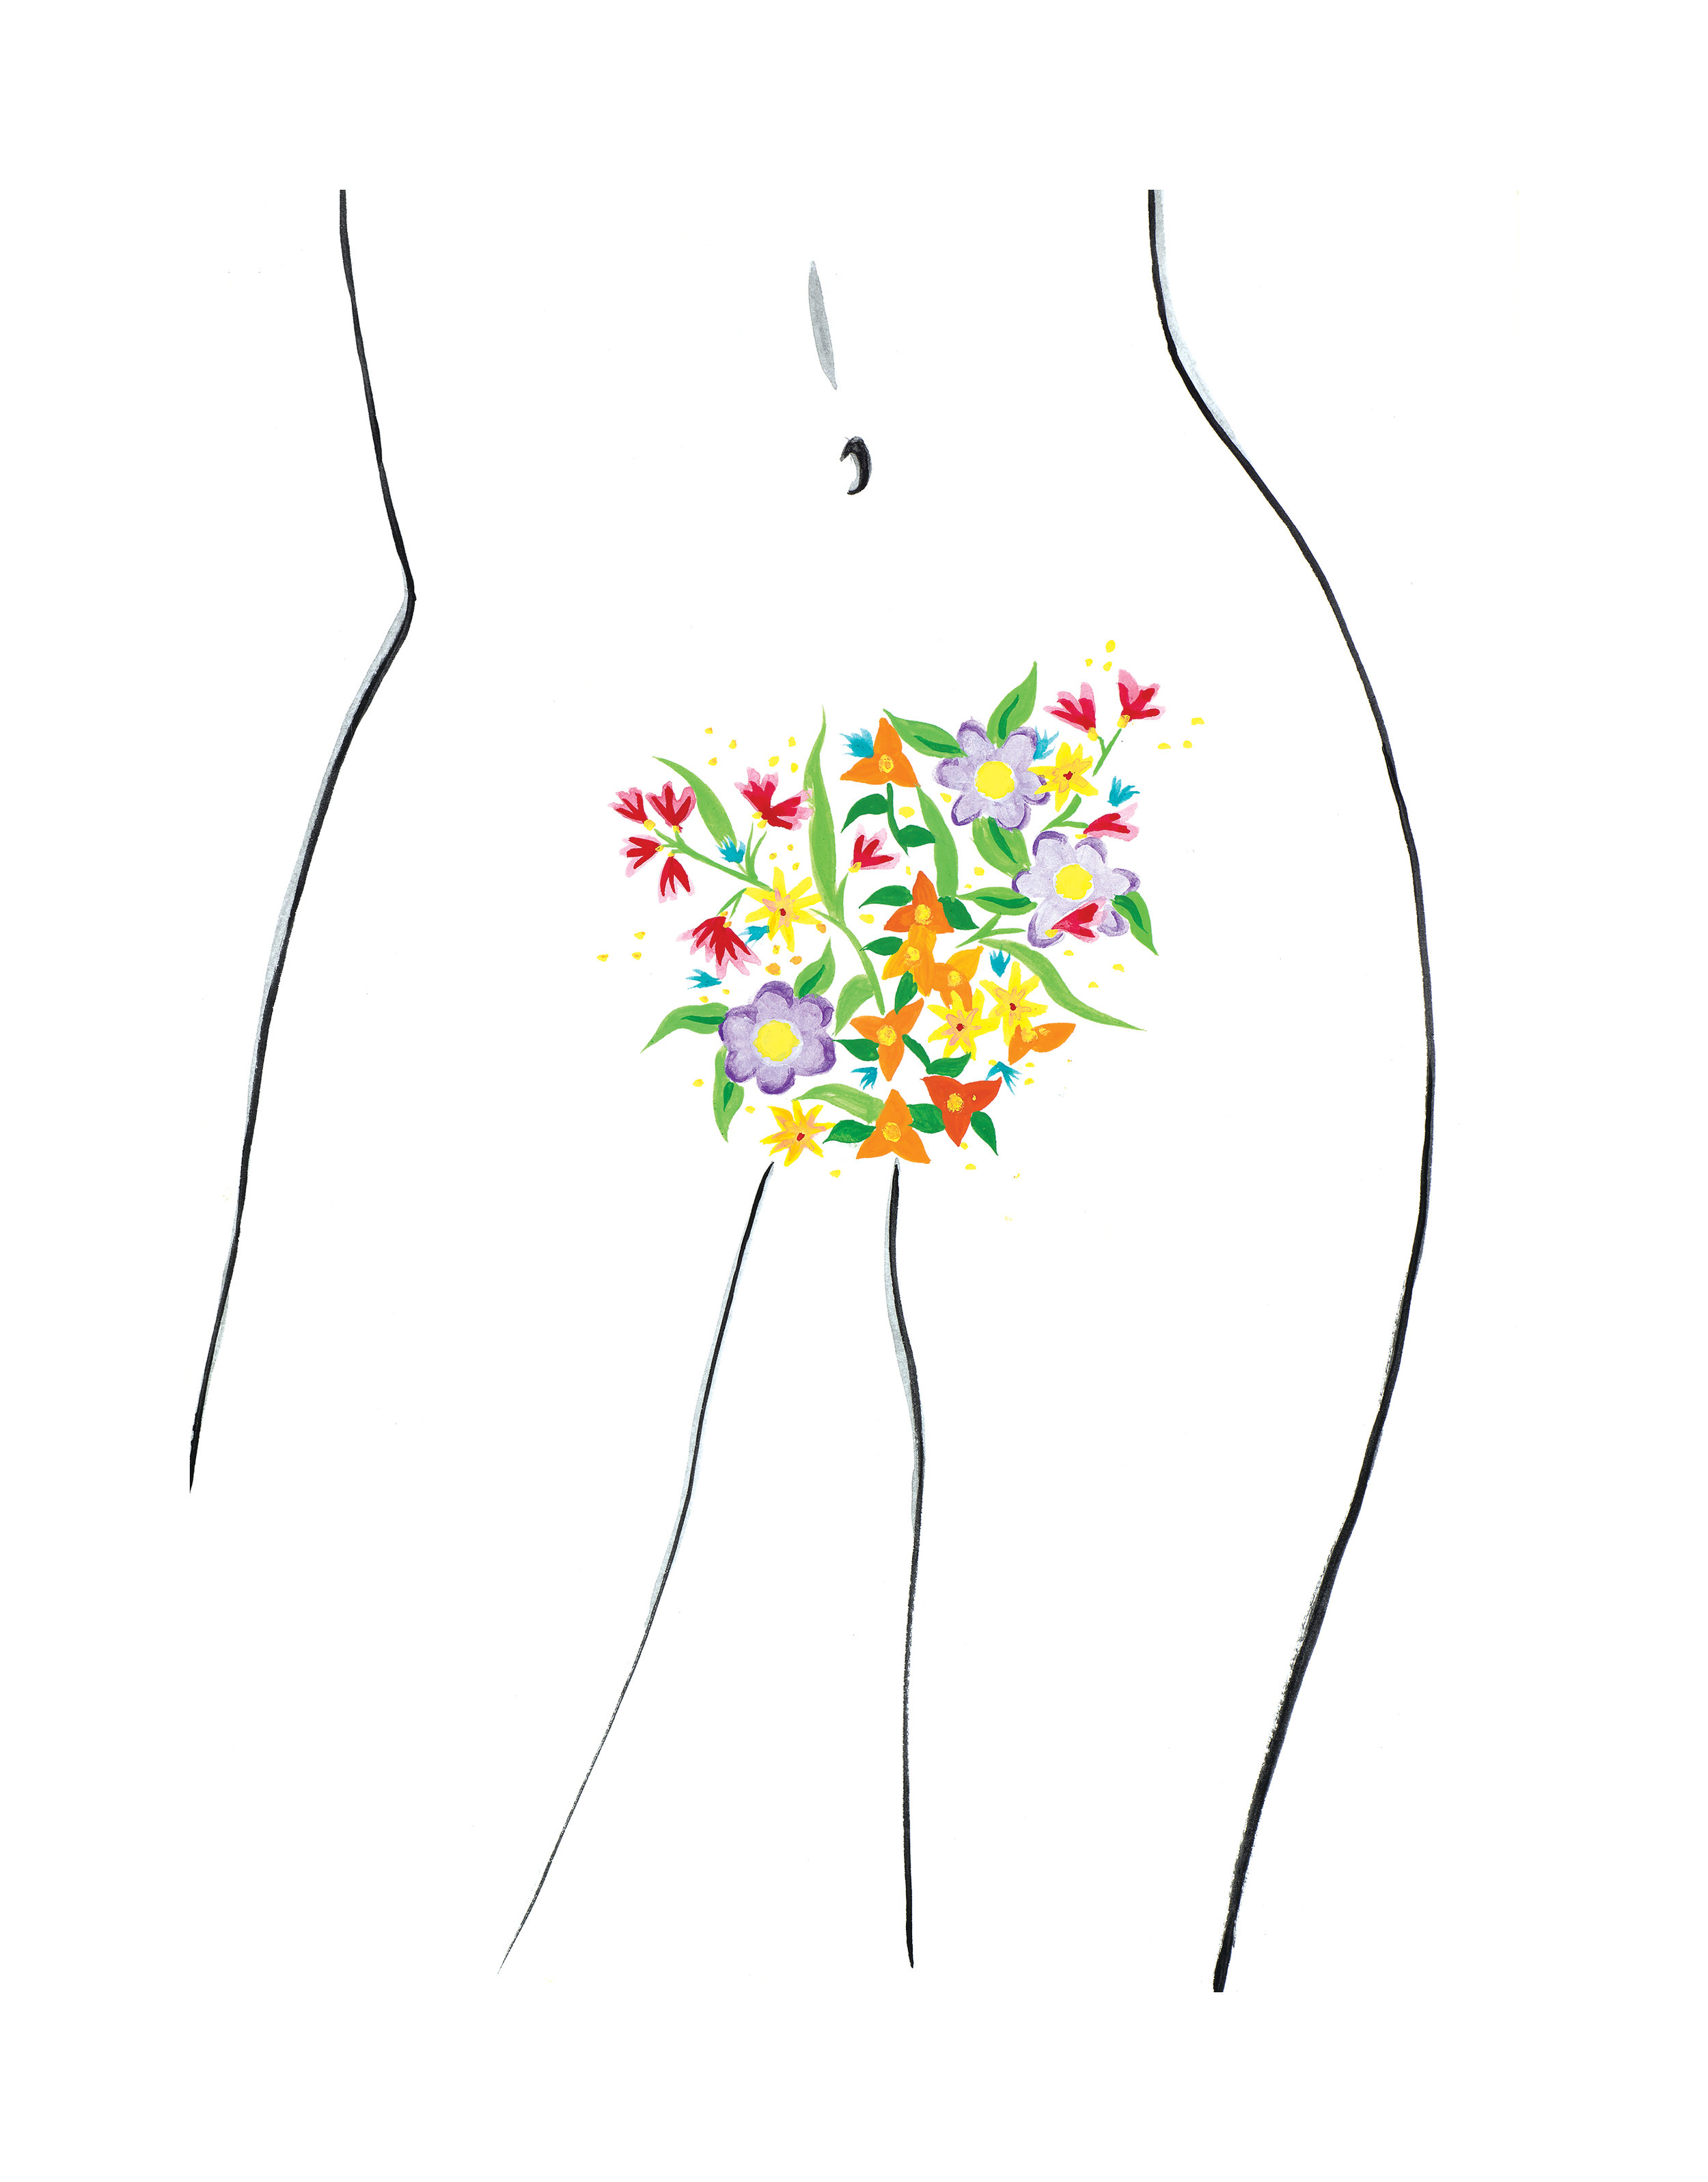 Super Bloom Print_1_resized recolored.JPG